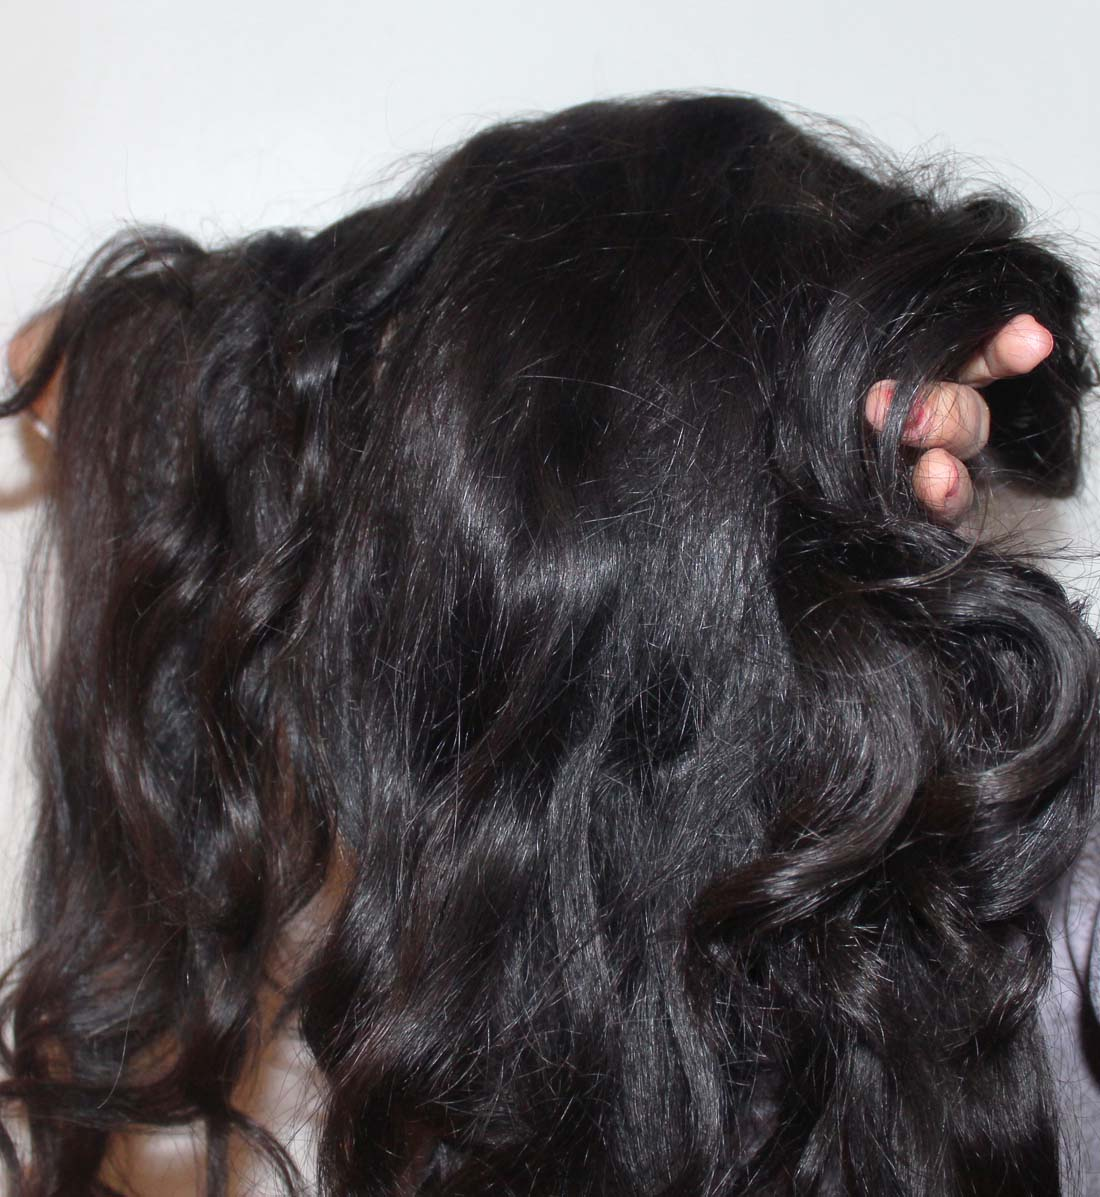 masse de cheveux dense et lumineuse apres le shikakai